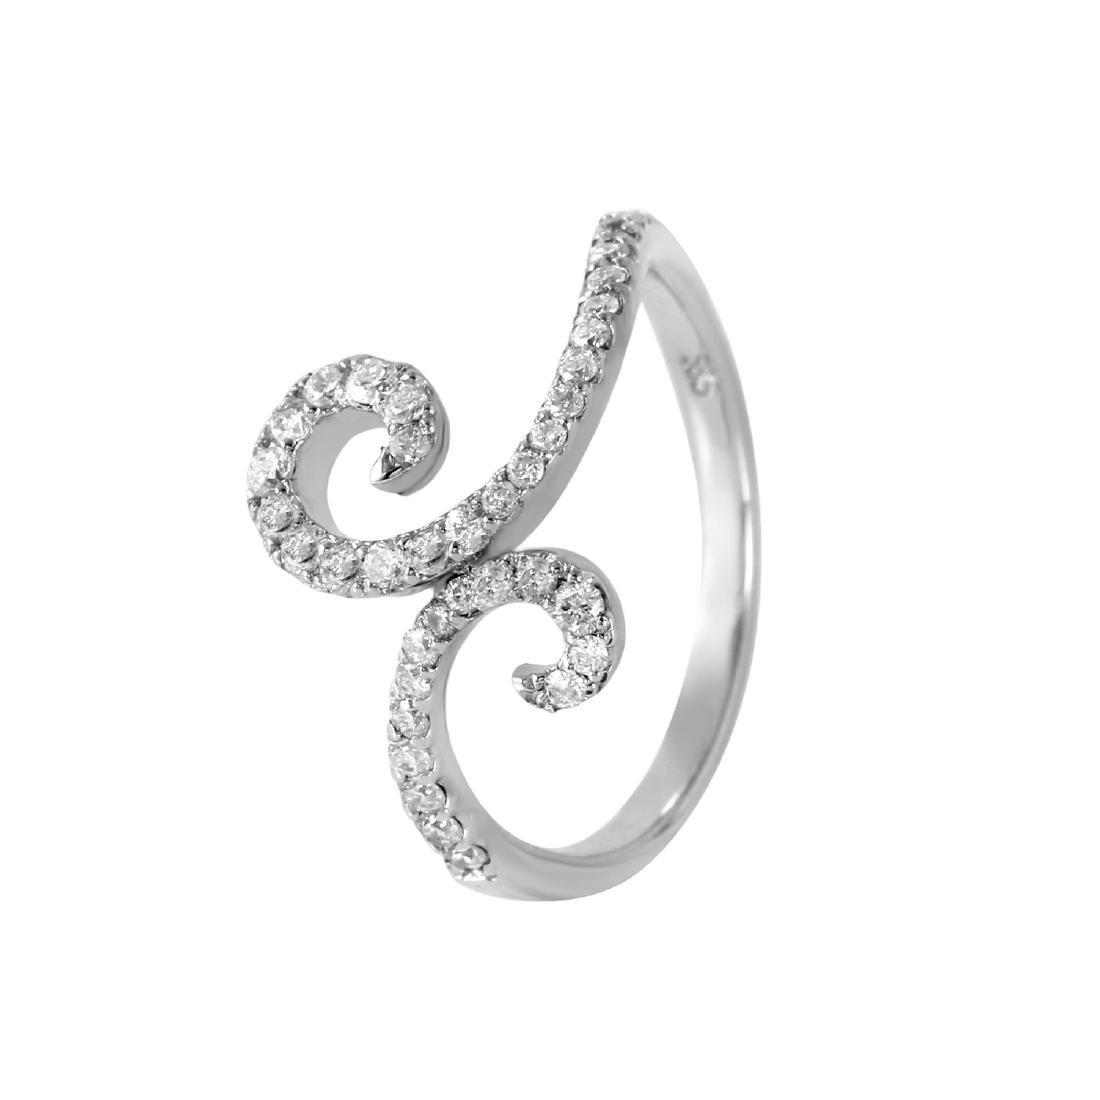 0.54 Carat Natural Diamond 18K Solid White Gold Ring